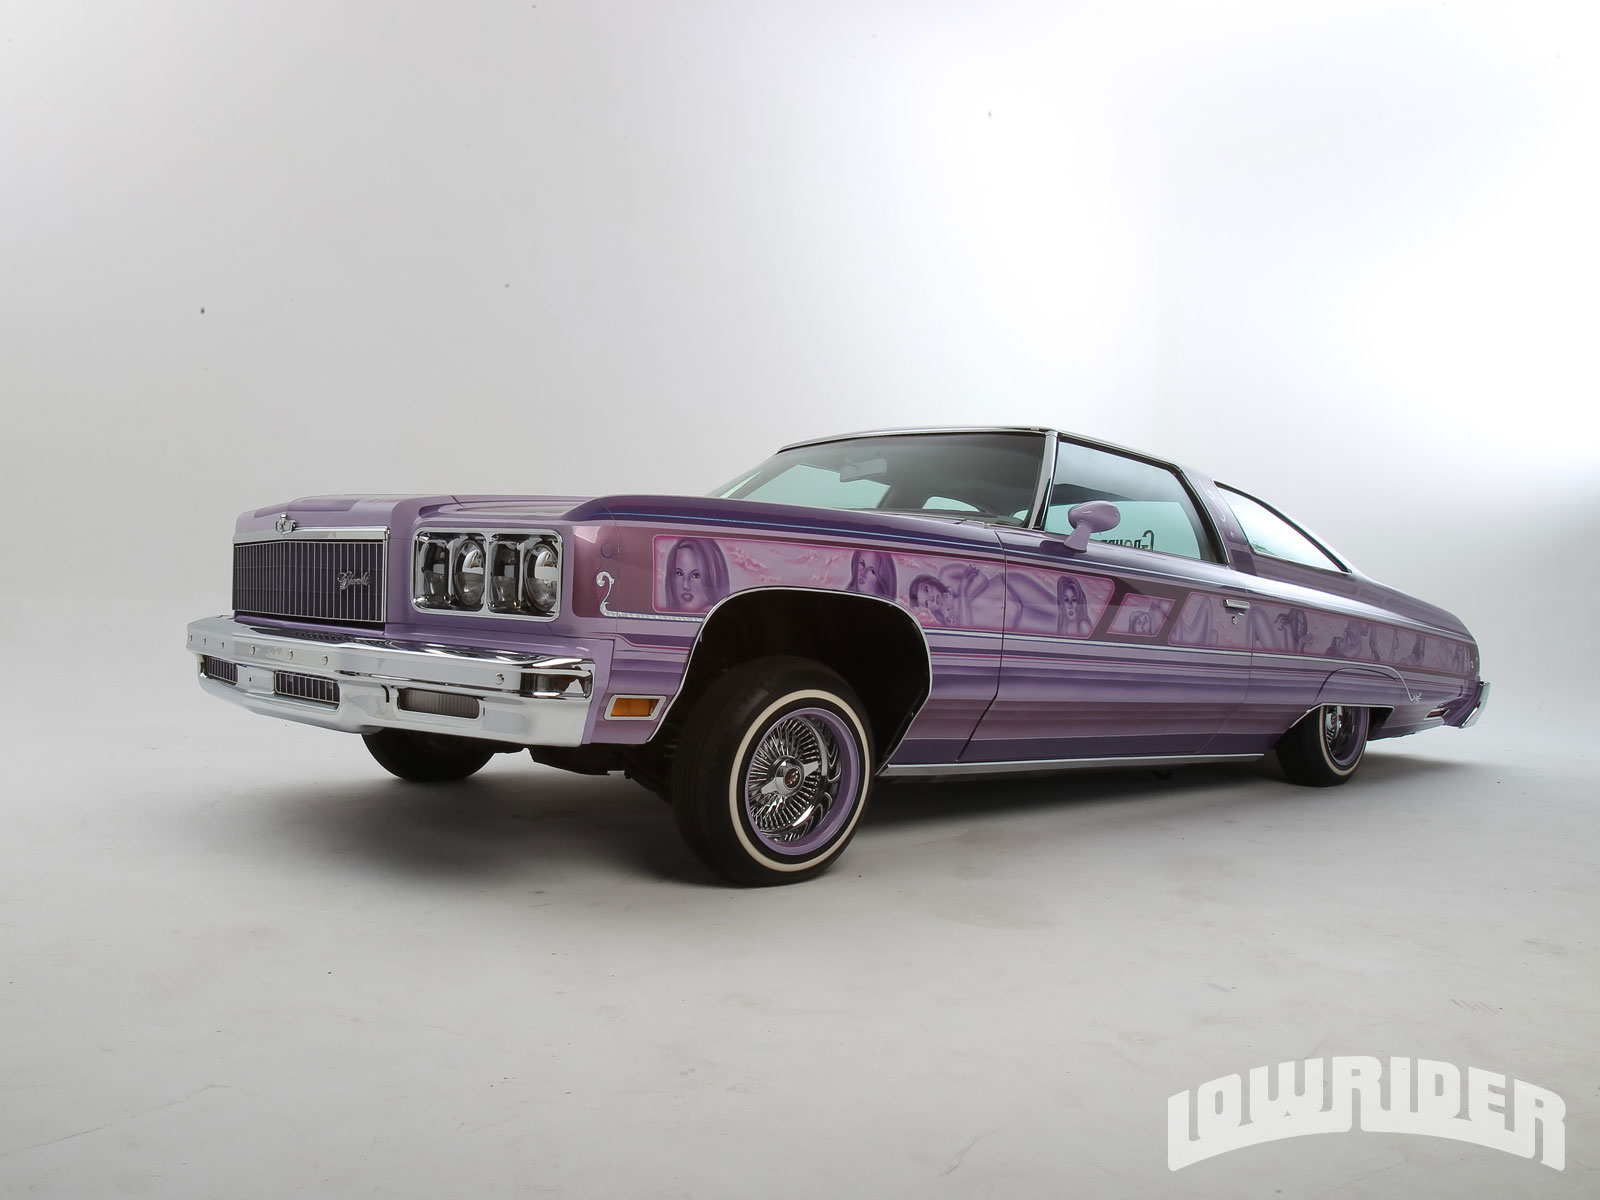 1975 Chevrolet Impala Glasshouse - Lowrider Magazine